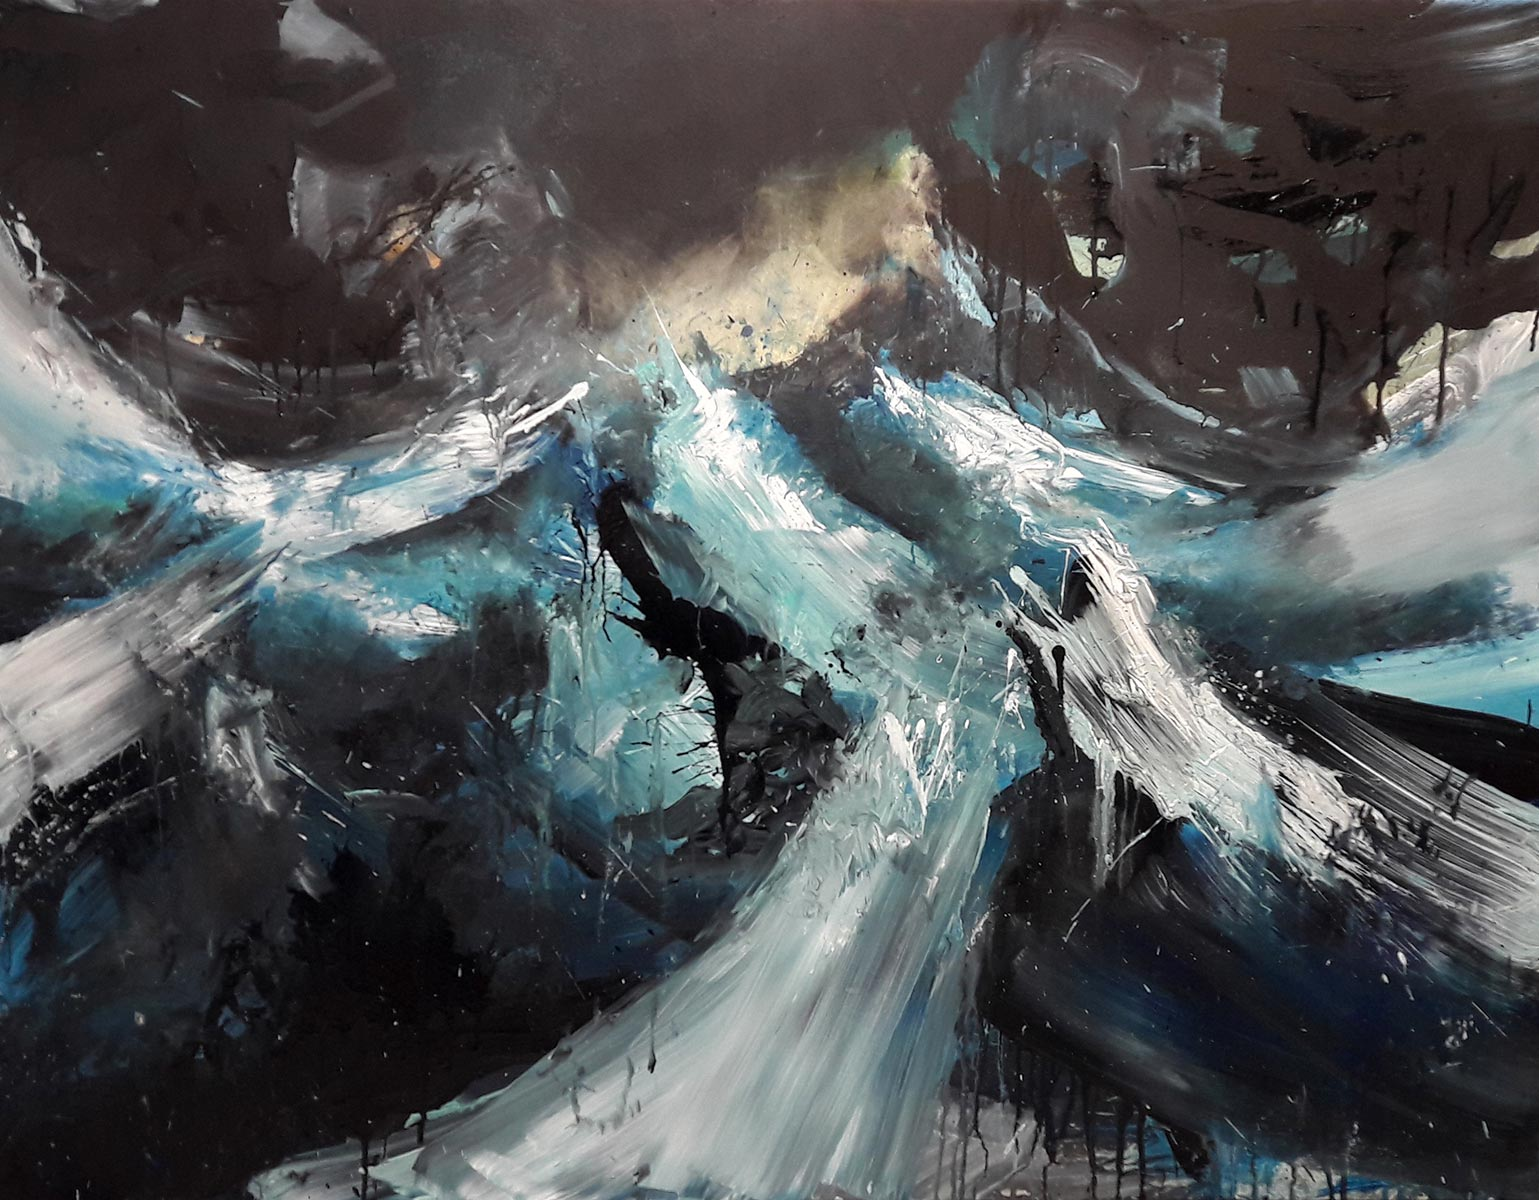 Tempête. 2018, acrílico sobre lienzo, 89 x 116 cm